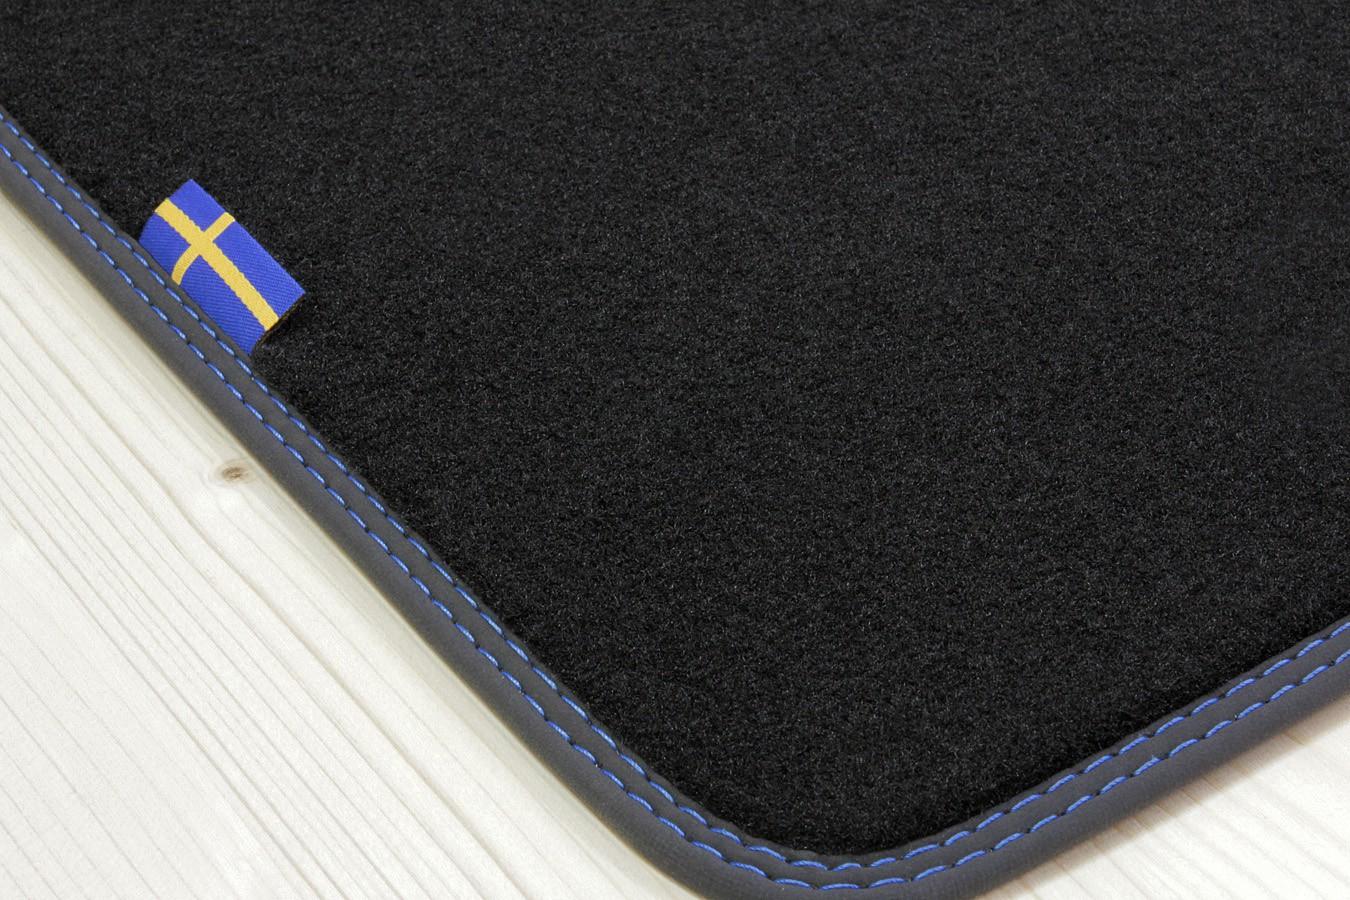 Design floor mats trunk mat for volvo xc90 from 01 2015 for Floor mat design